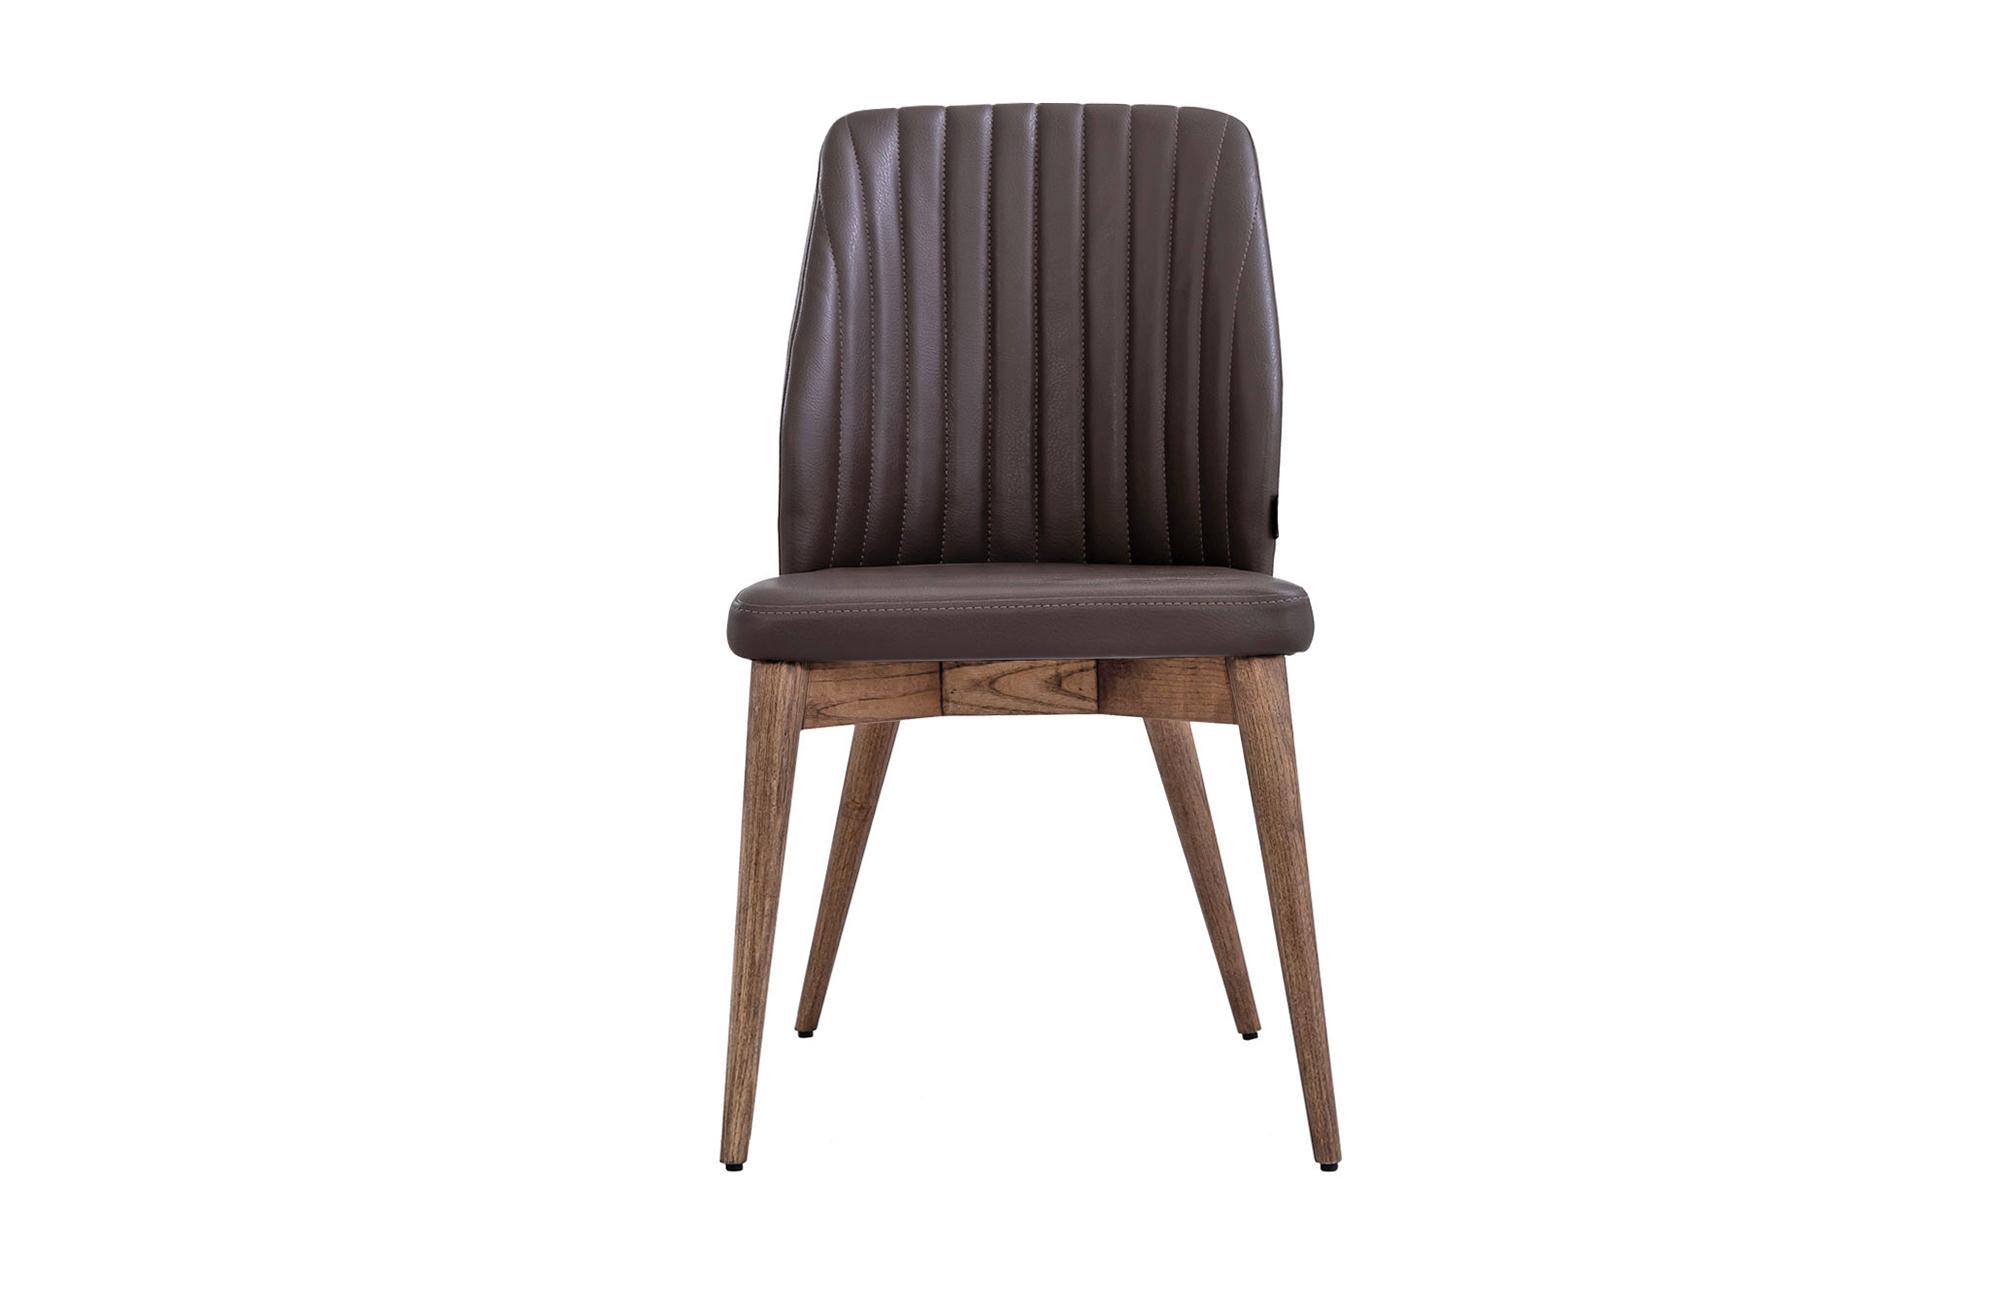 Pierra Dining Chair